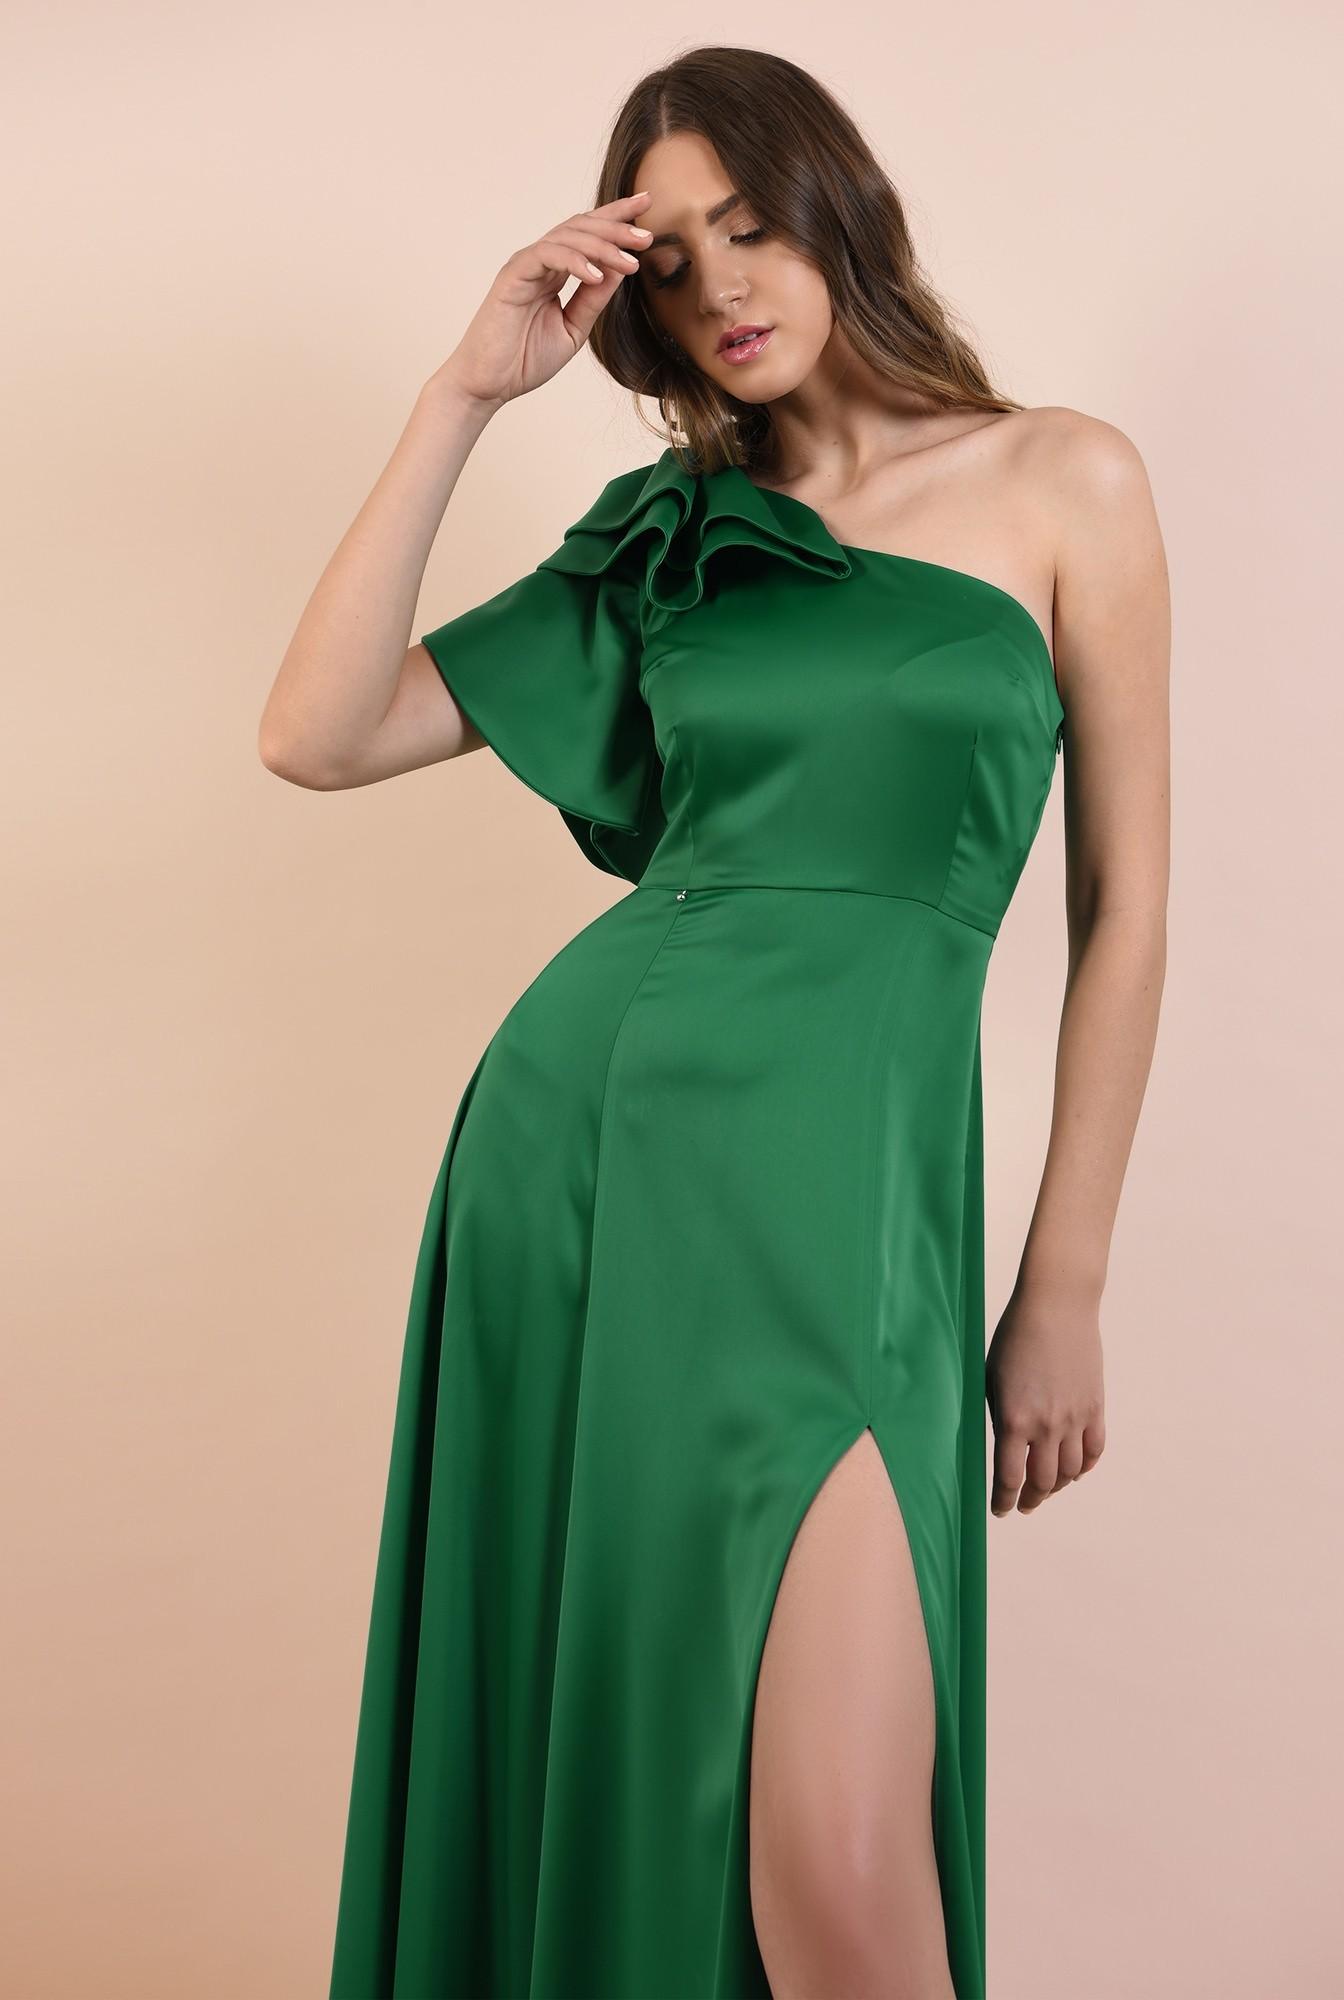 2 - rochie de ocazie, lunga, verde, cu crapeu, cu volane la umar, maneca lalea